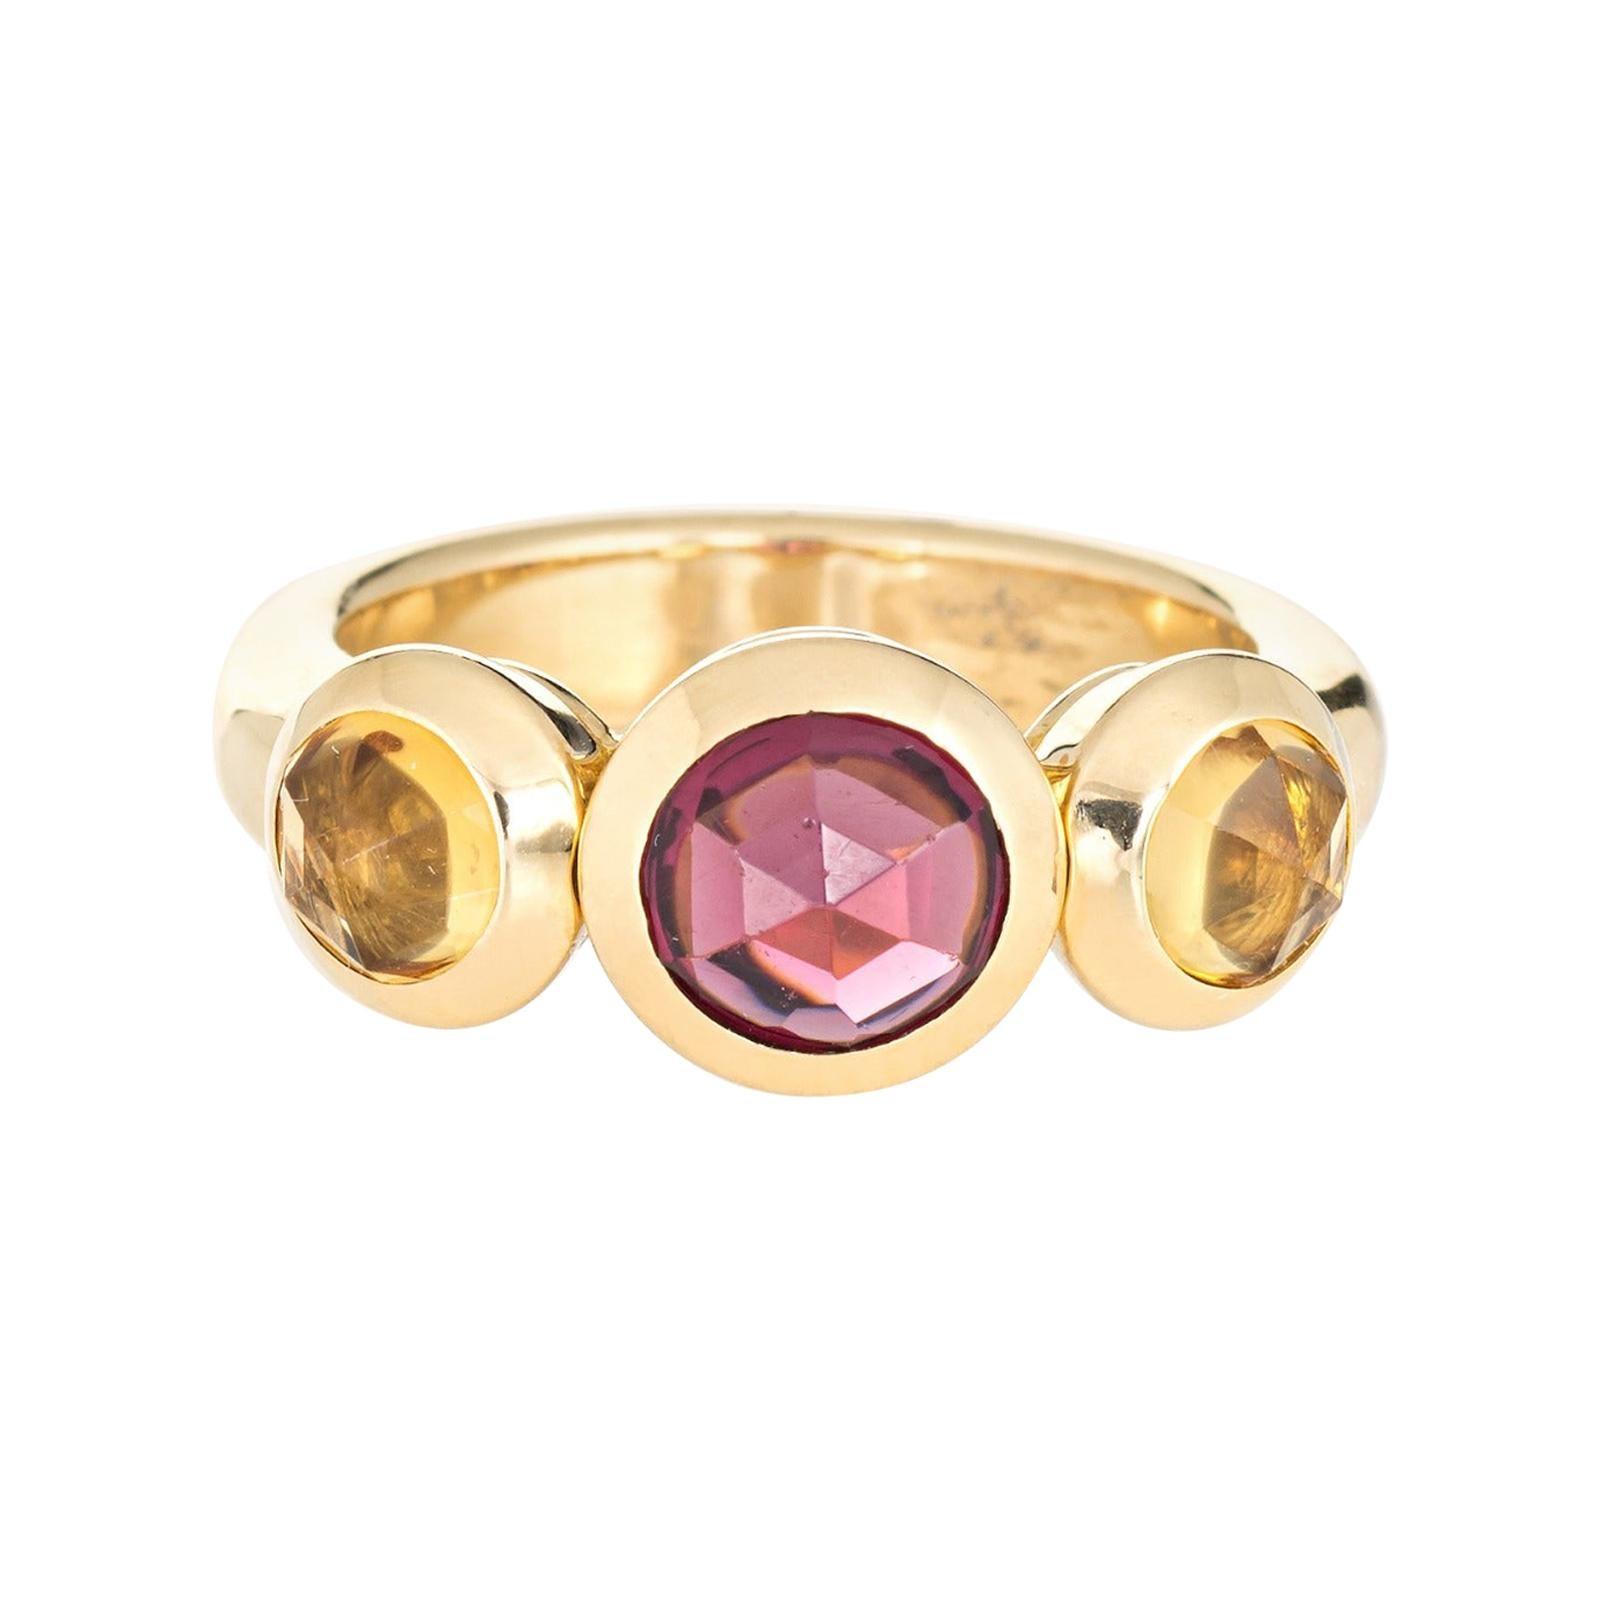 Tiffany & Co. Garnet Citrine Ring Estate 18k Gold France Signed Jewelry